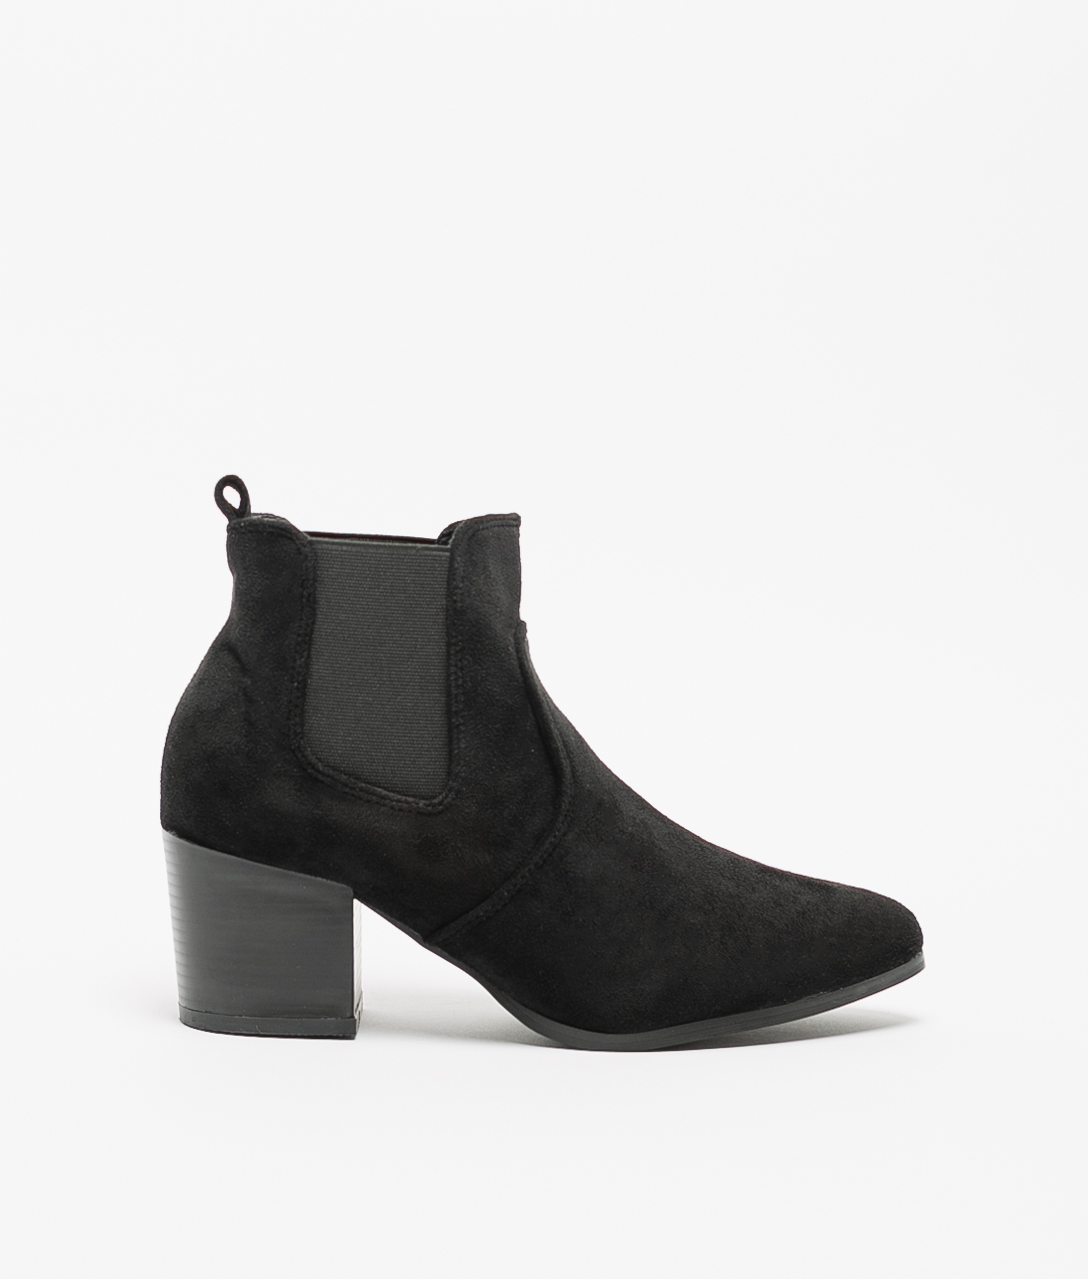 Bota Petite Tuca - Noir